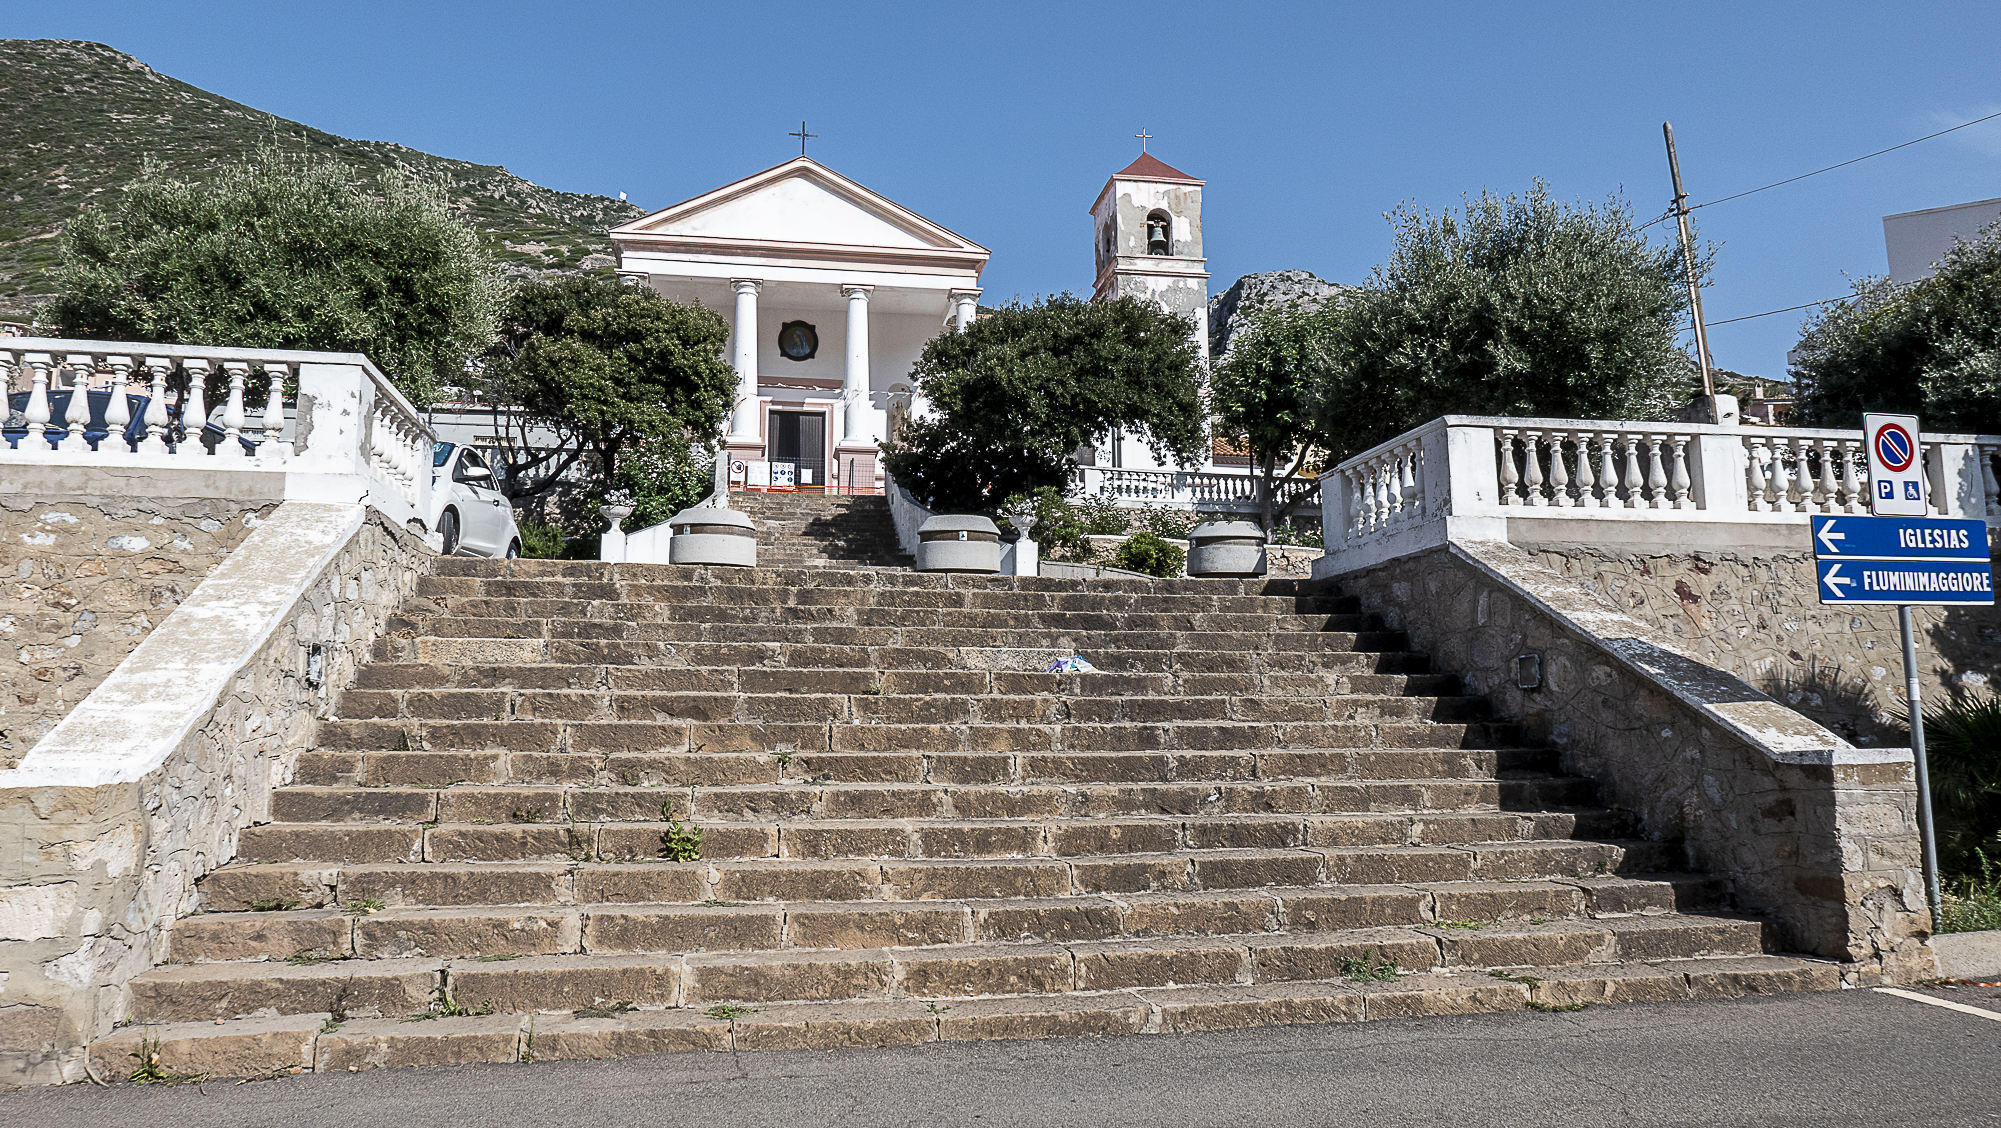 chiesa di Buggerru costruita dalla societ minerariaJPG